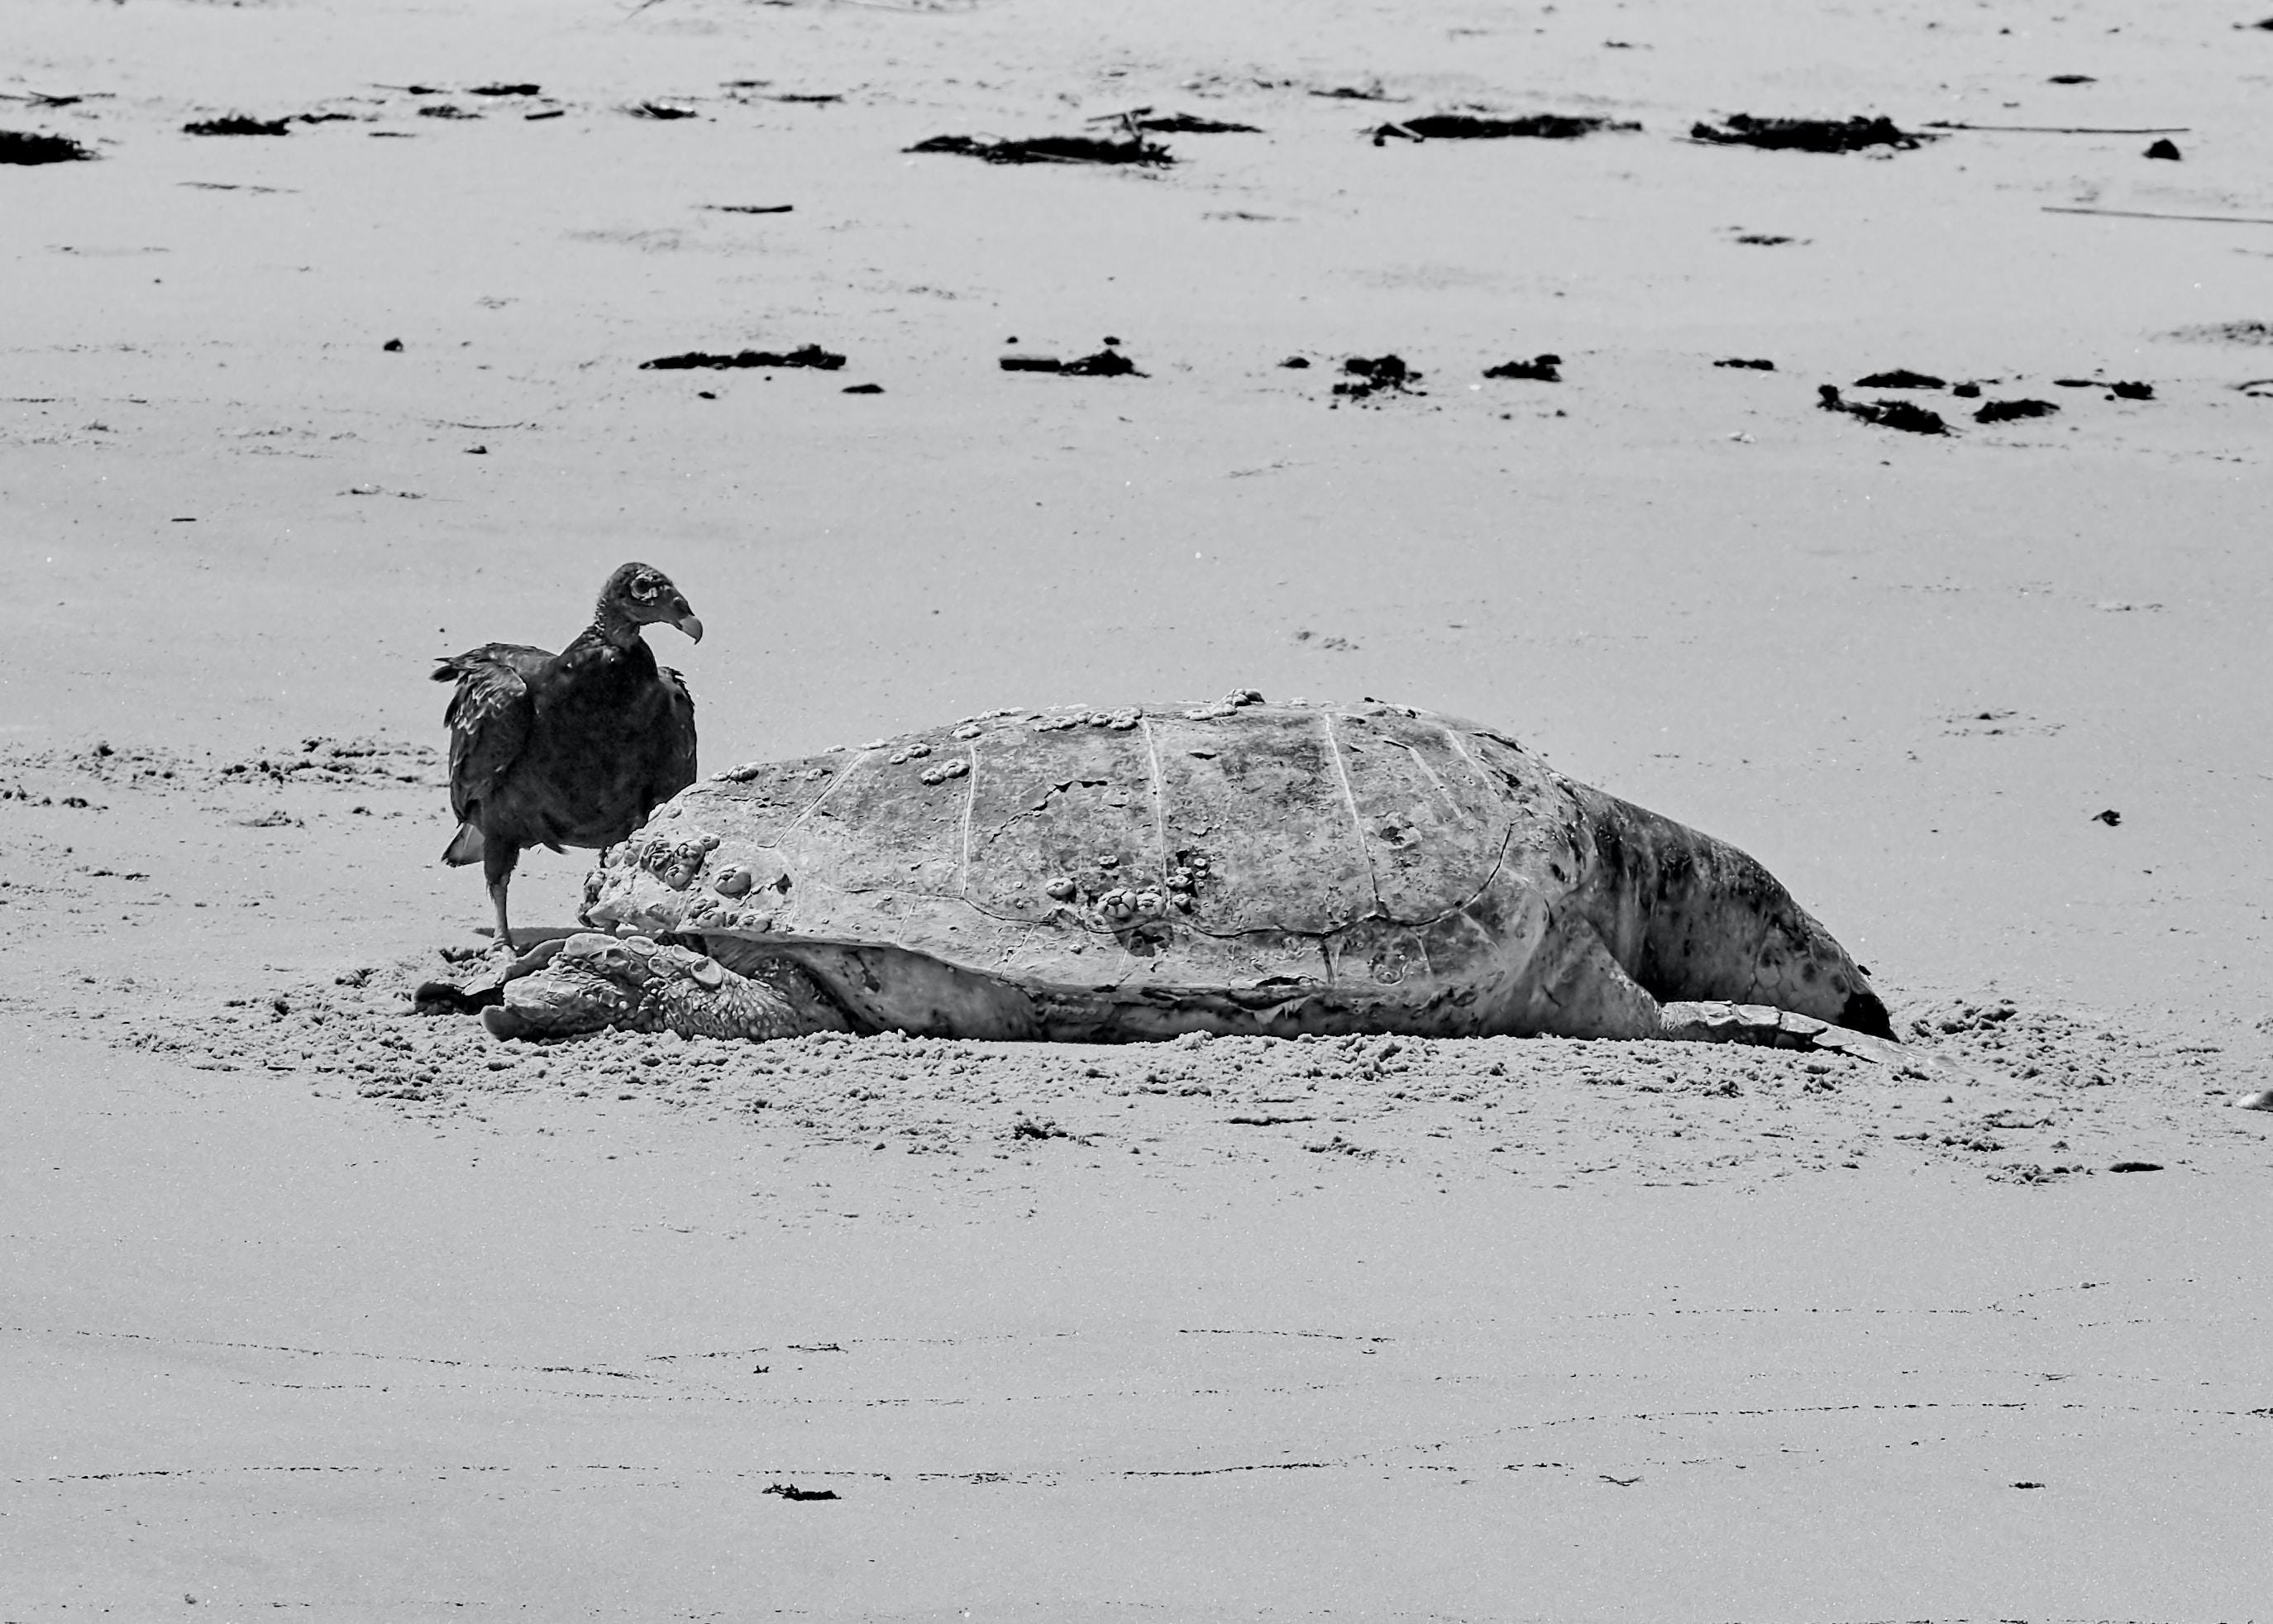 sea turtle beside condor